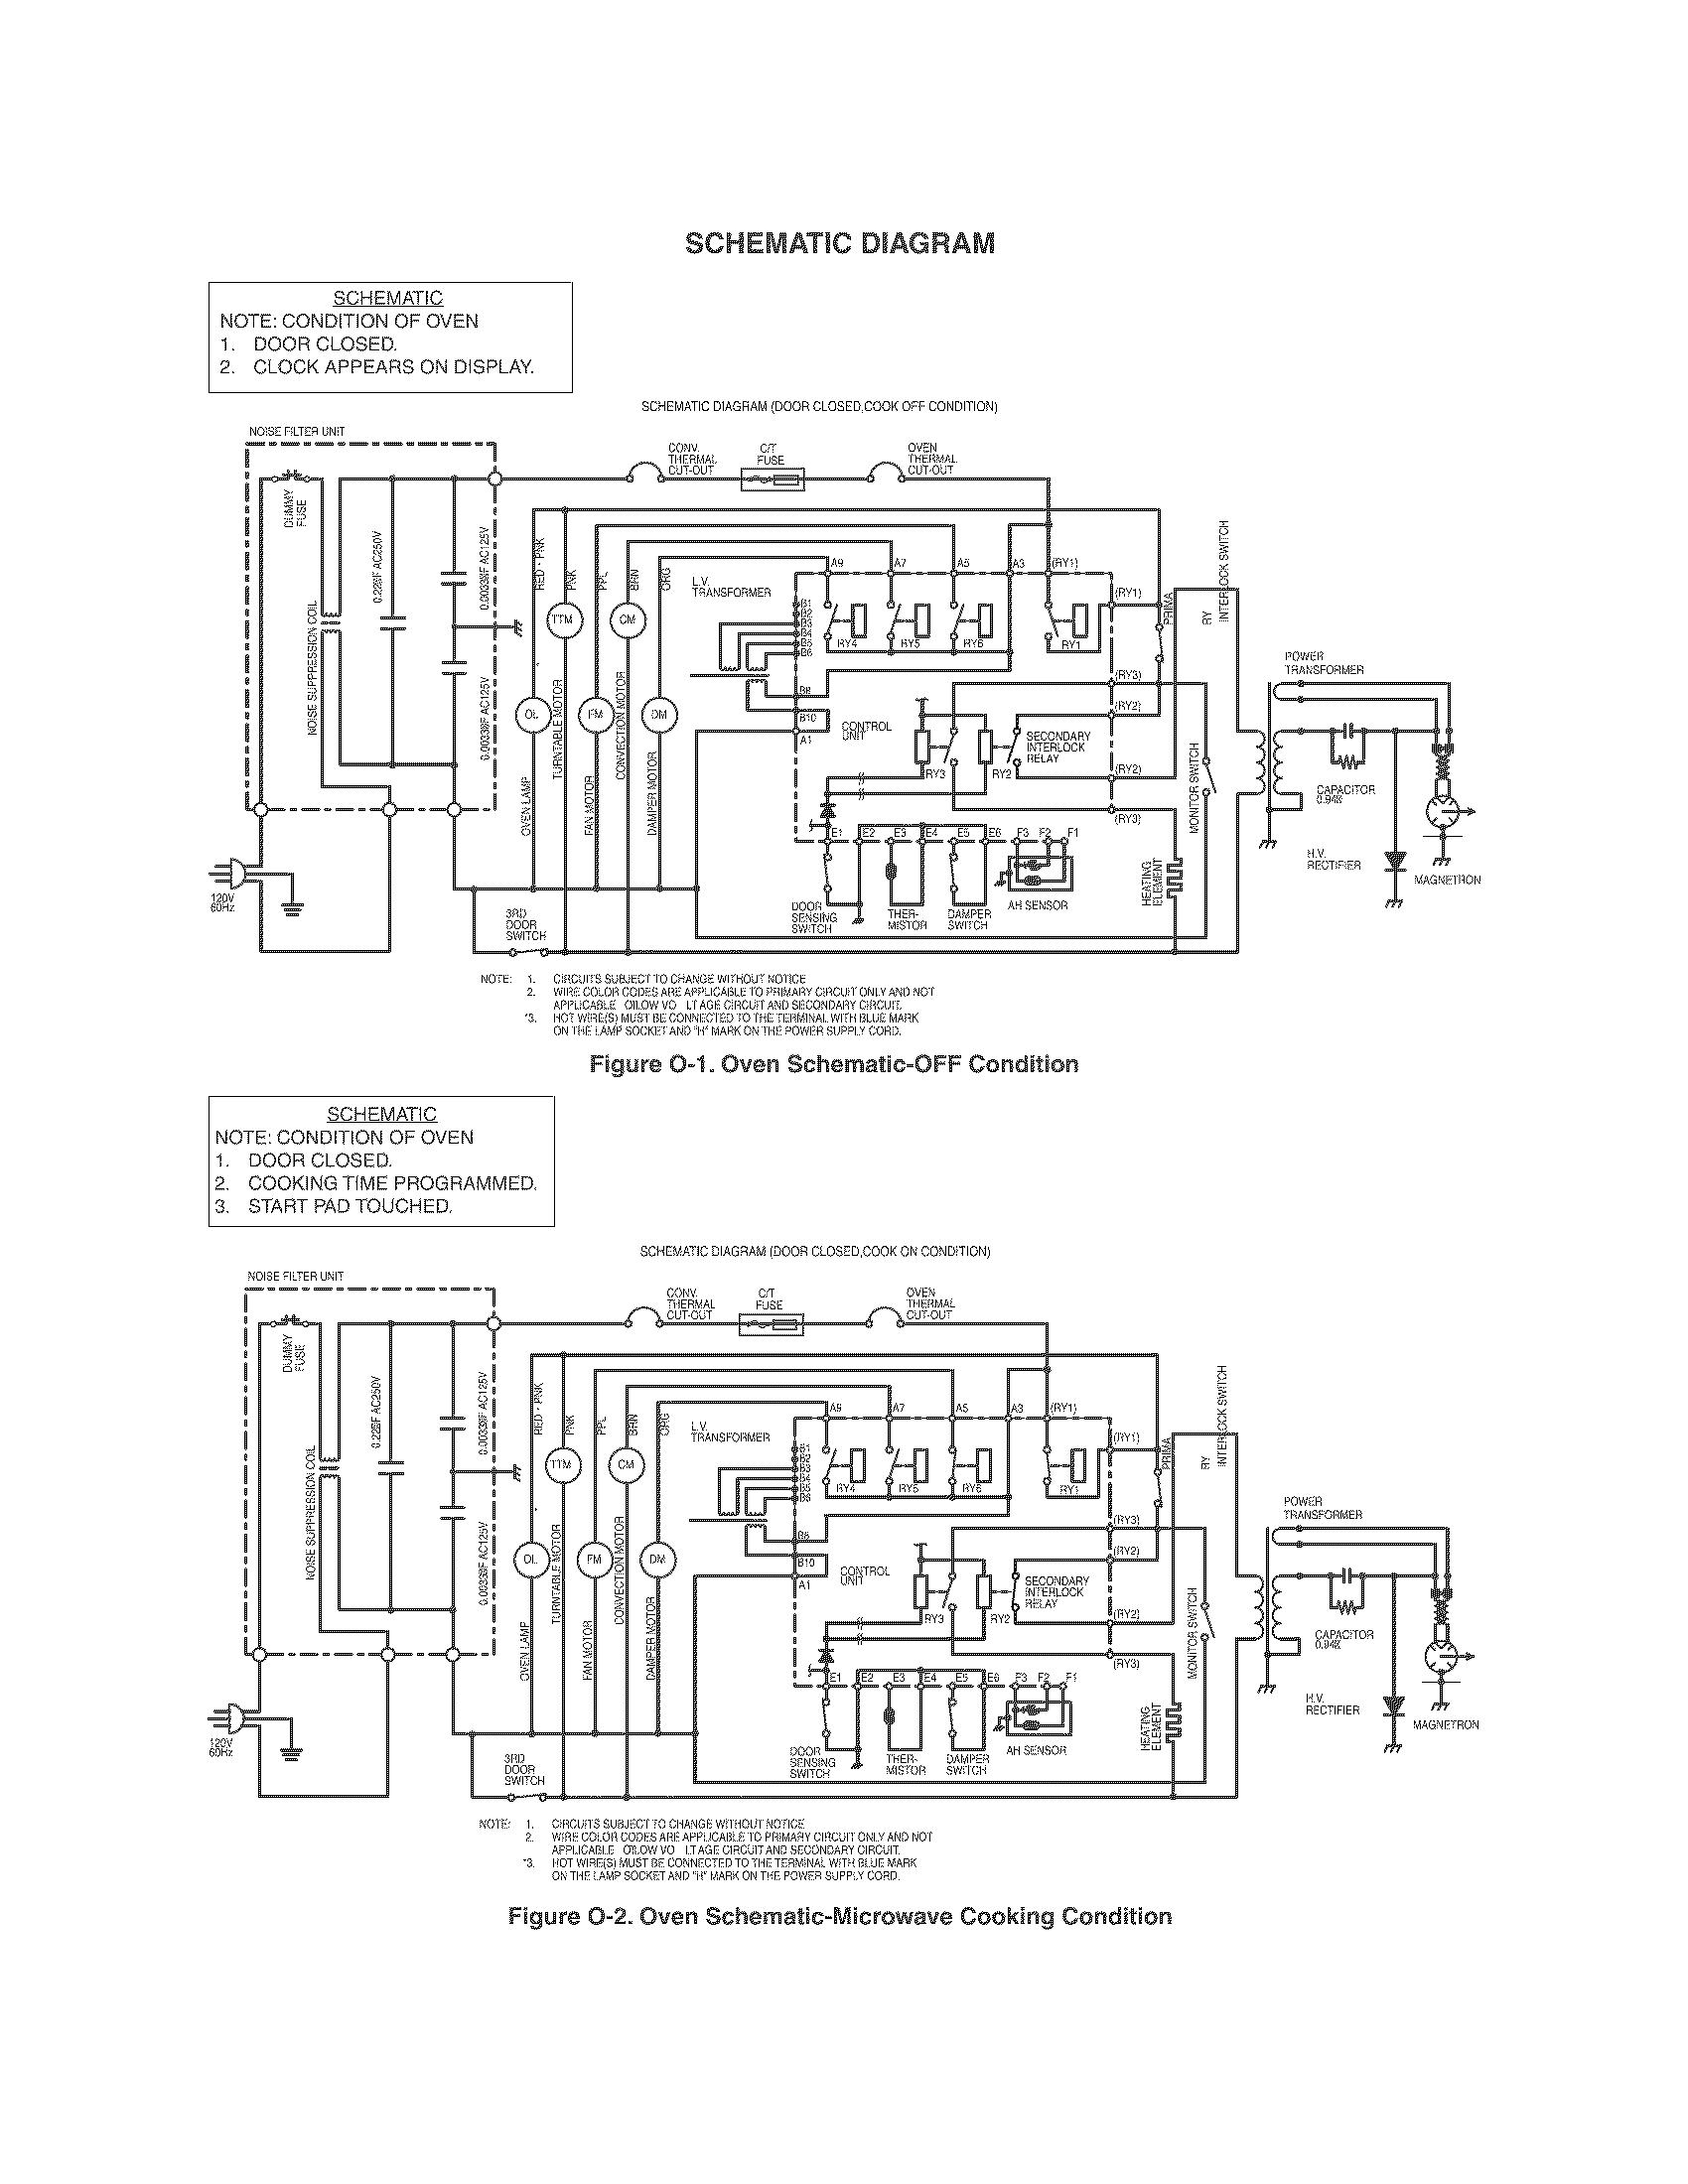 R1504086 00003?resize\=1000%2C1294 oldsmobile ac wiring diagram html alfa romeo wiring diagrams Basic Electrical Wiring Diagrams at bakdesigns.co